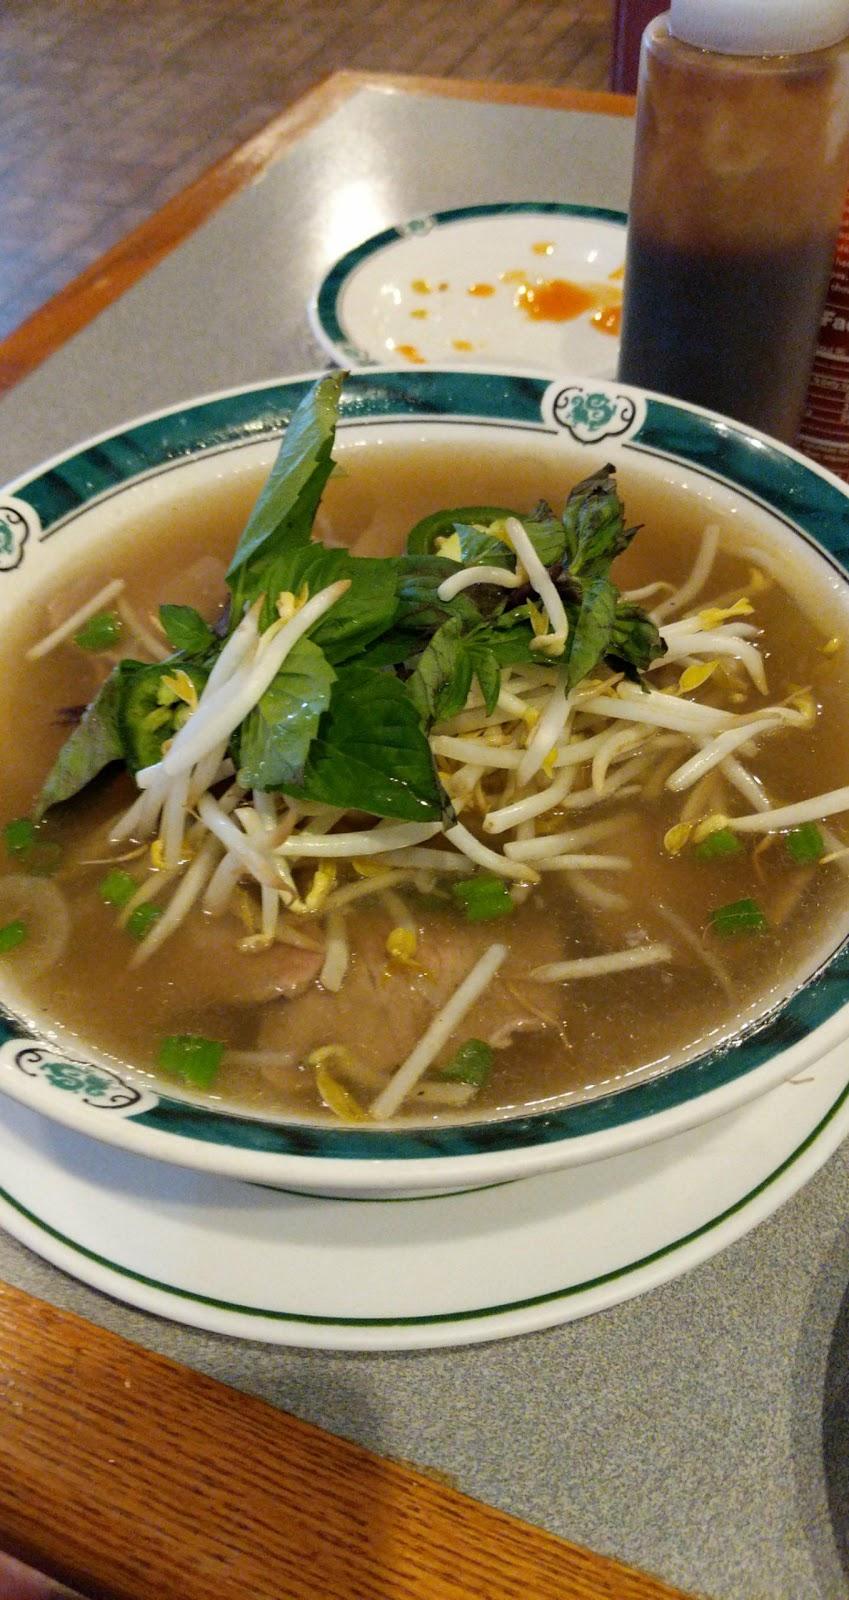 Saigon Panda | restaurant | 3301 E 26th St, Sioux Falls, SD 57103, USA | 6053358825 OR +1 605-335-8825